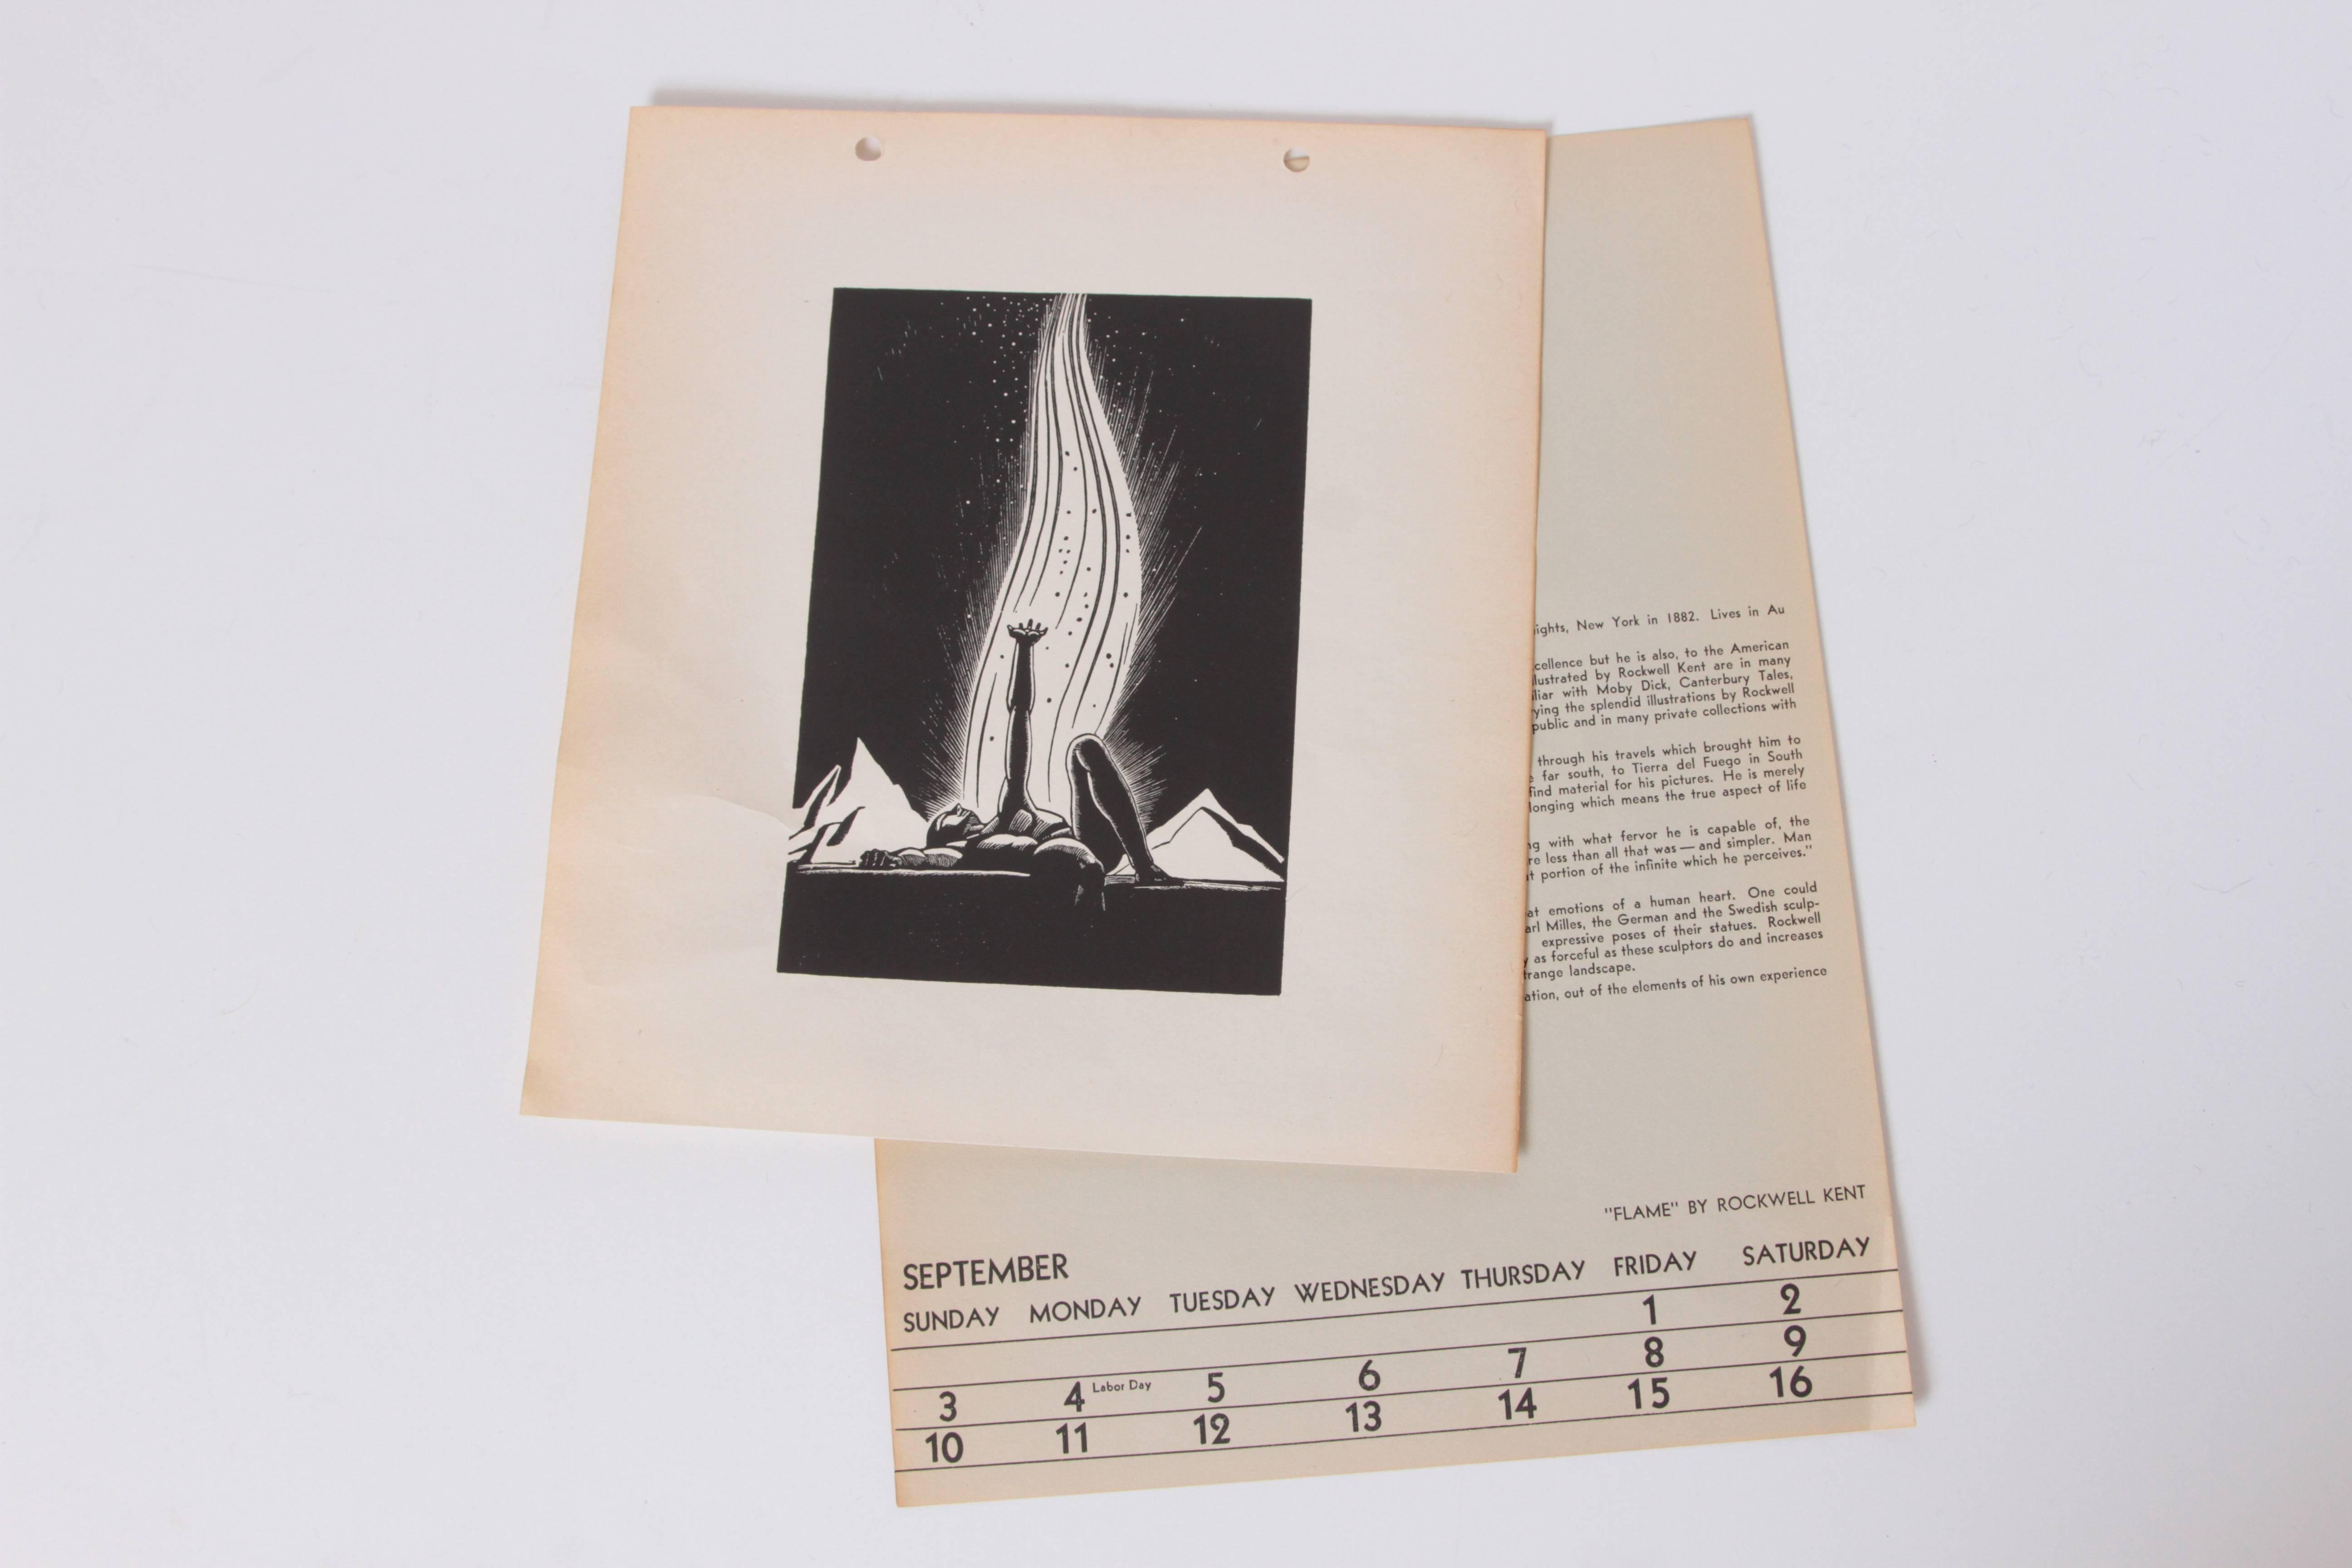 Art deco 1939 rockwell kent flame original block print calendar for sale at 1stdibs